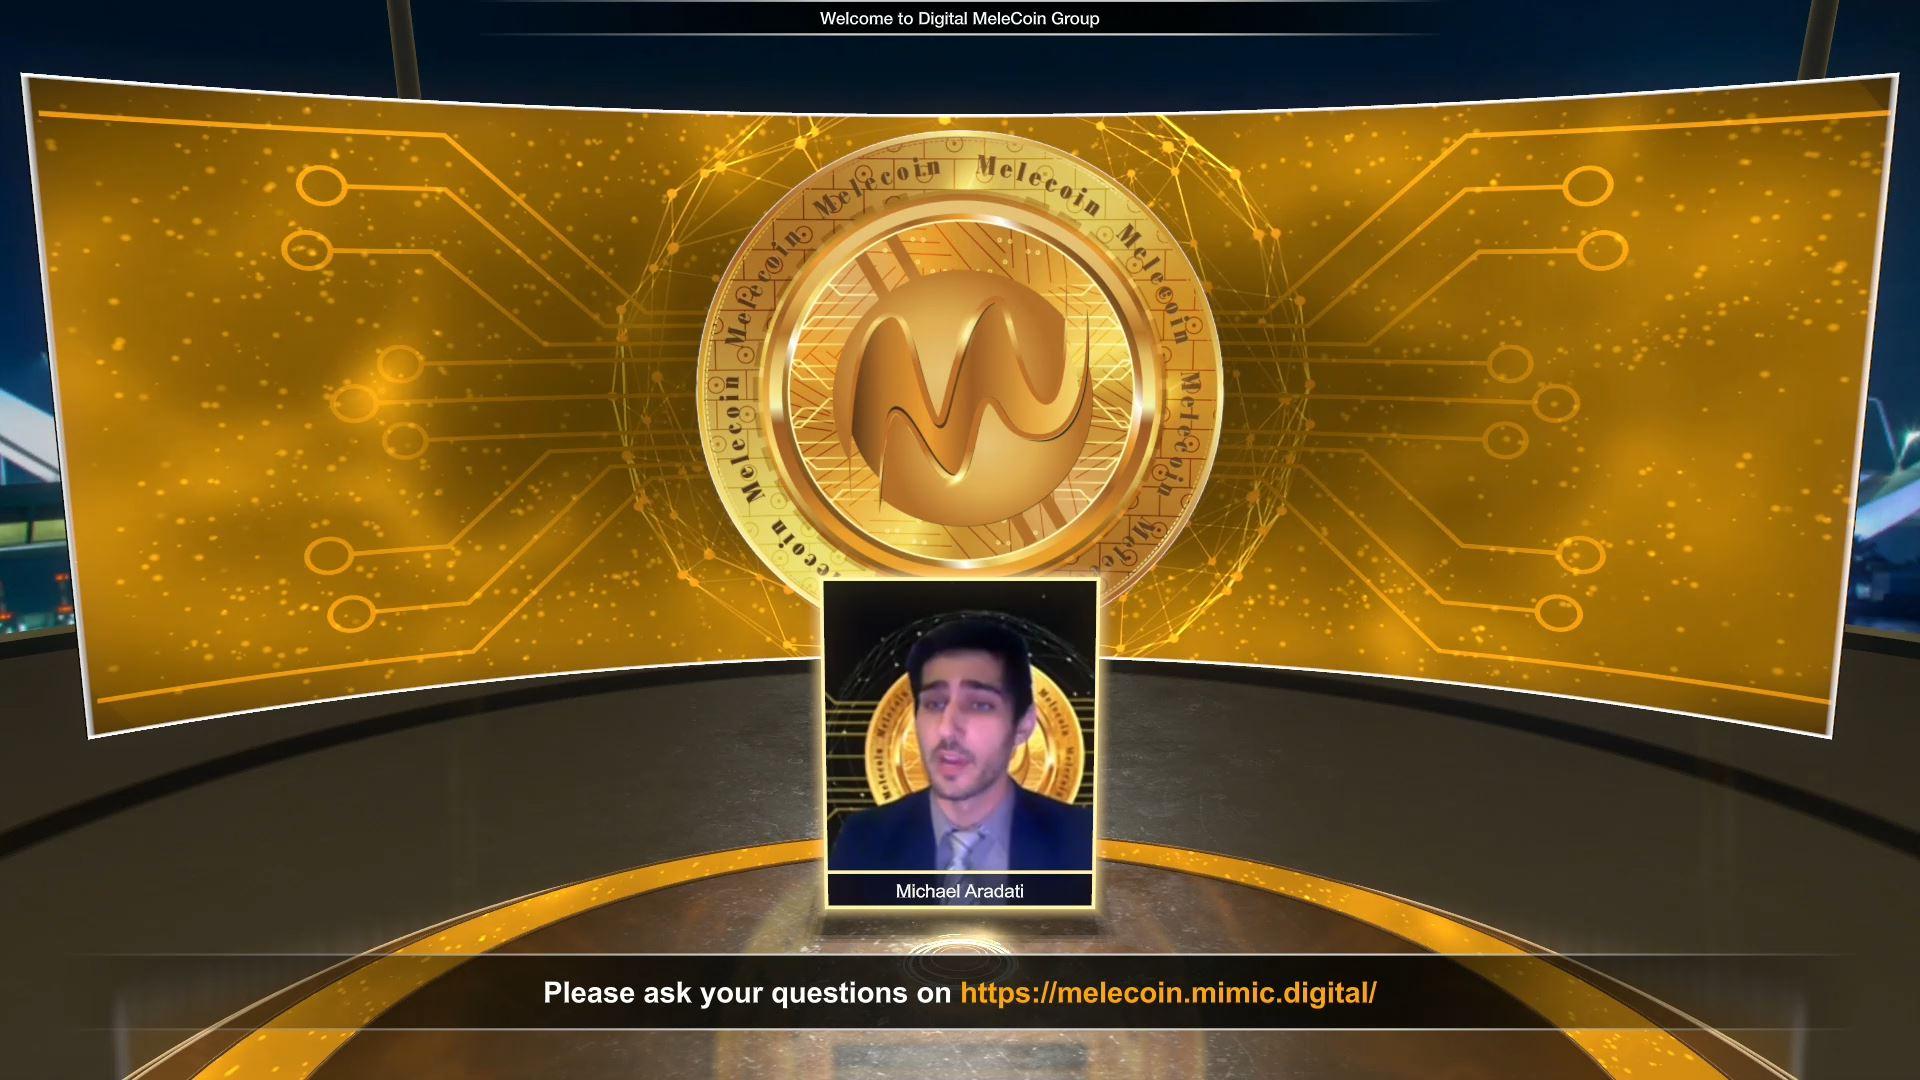 melecoin blockchain technology virtual event virtual host